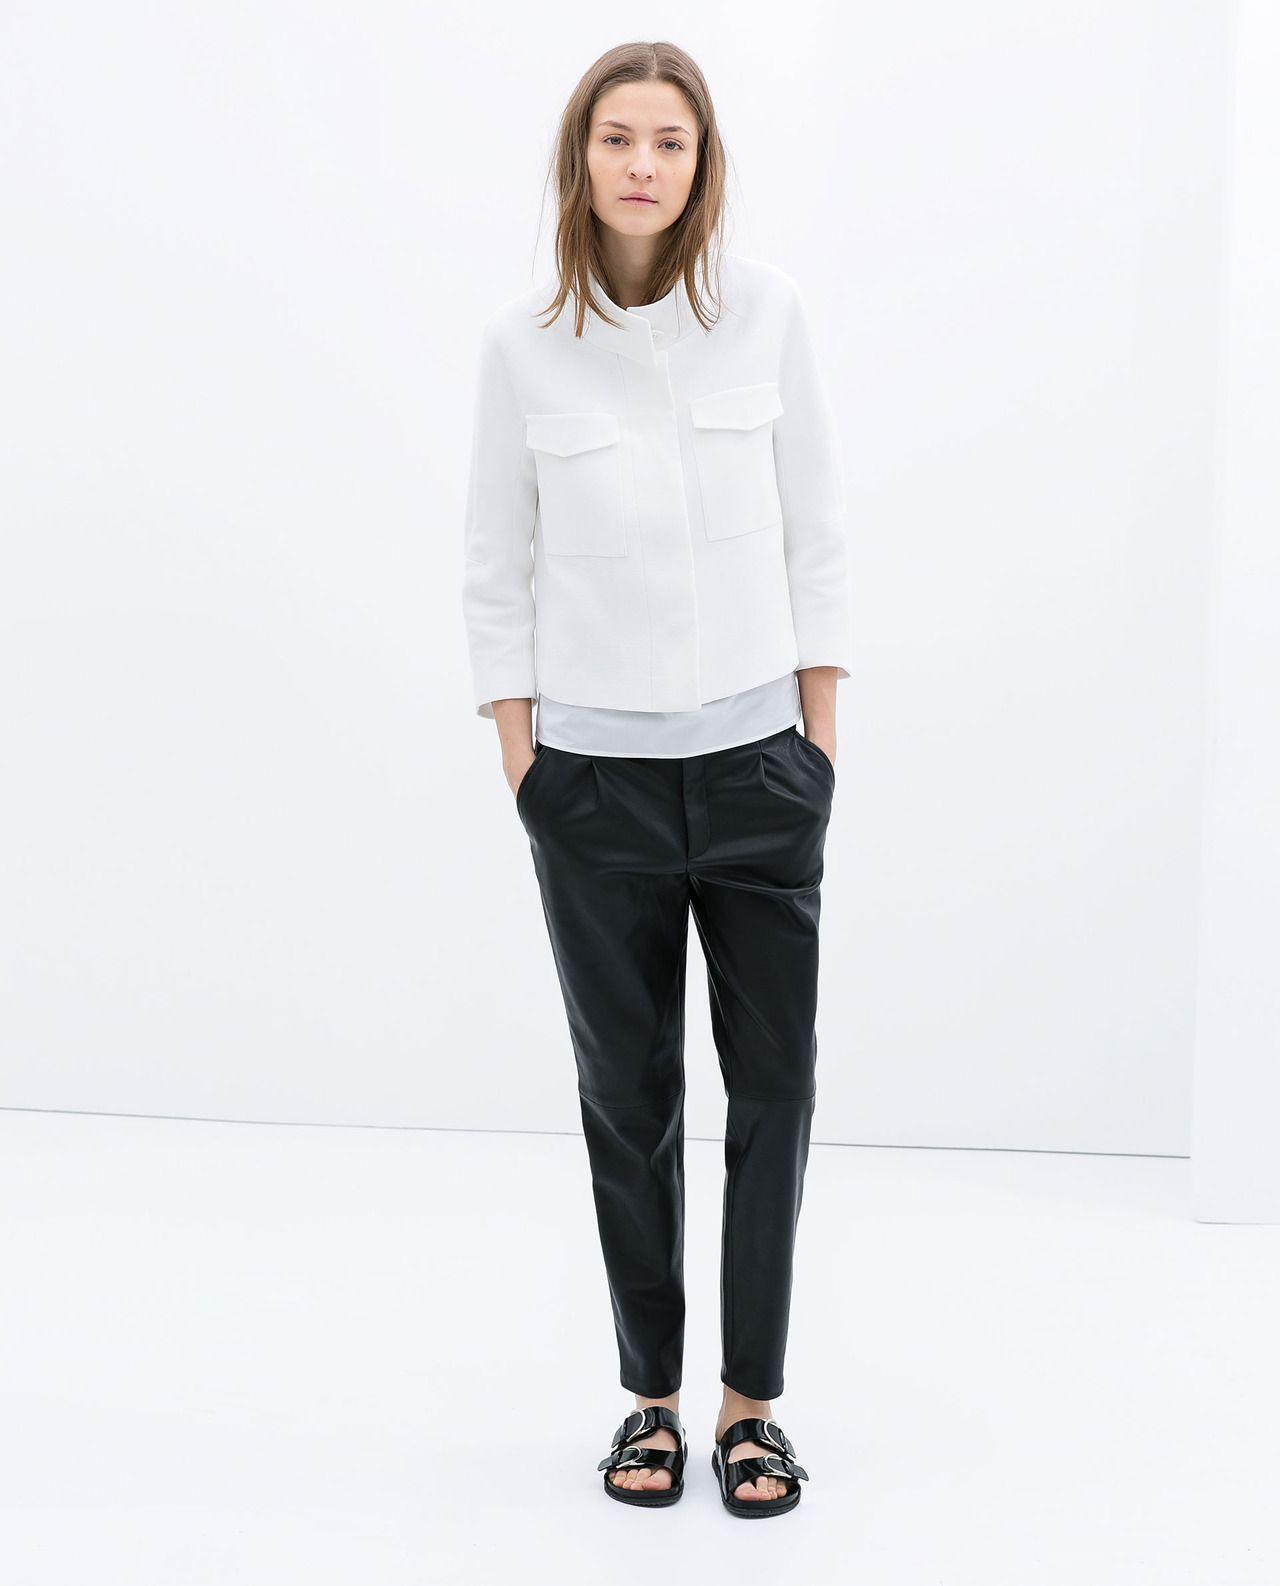 F De Pinterest Zara orm Minimal Stylish co Chic qwznxCfP